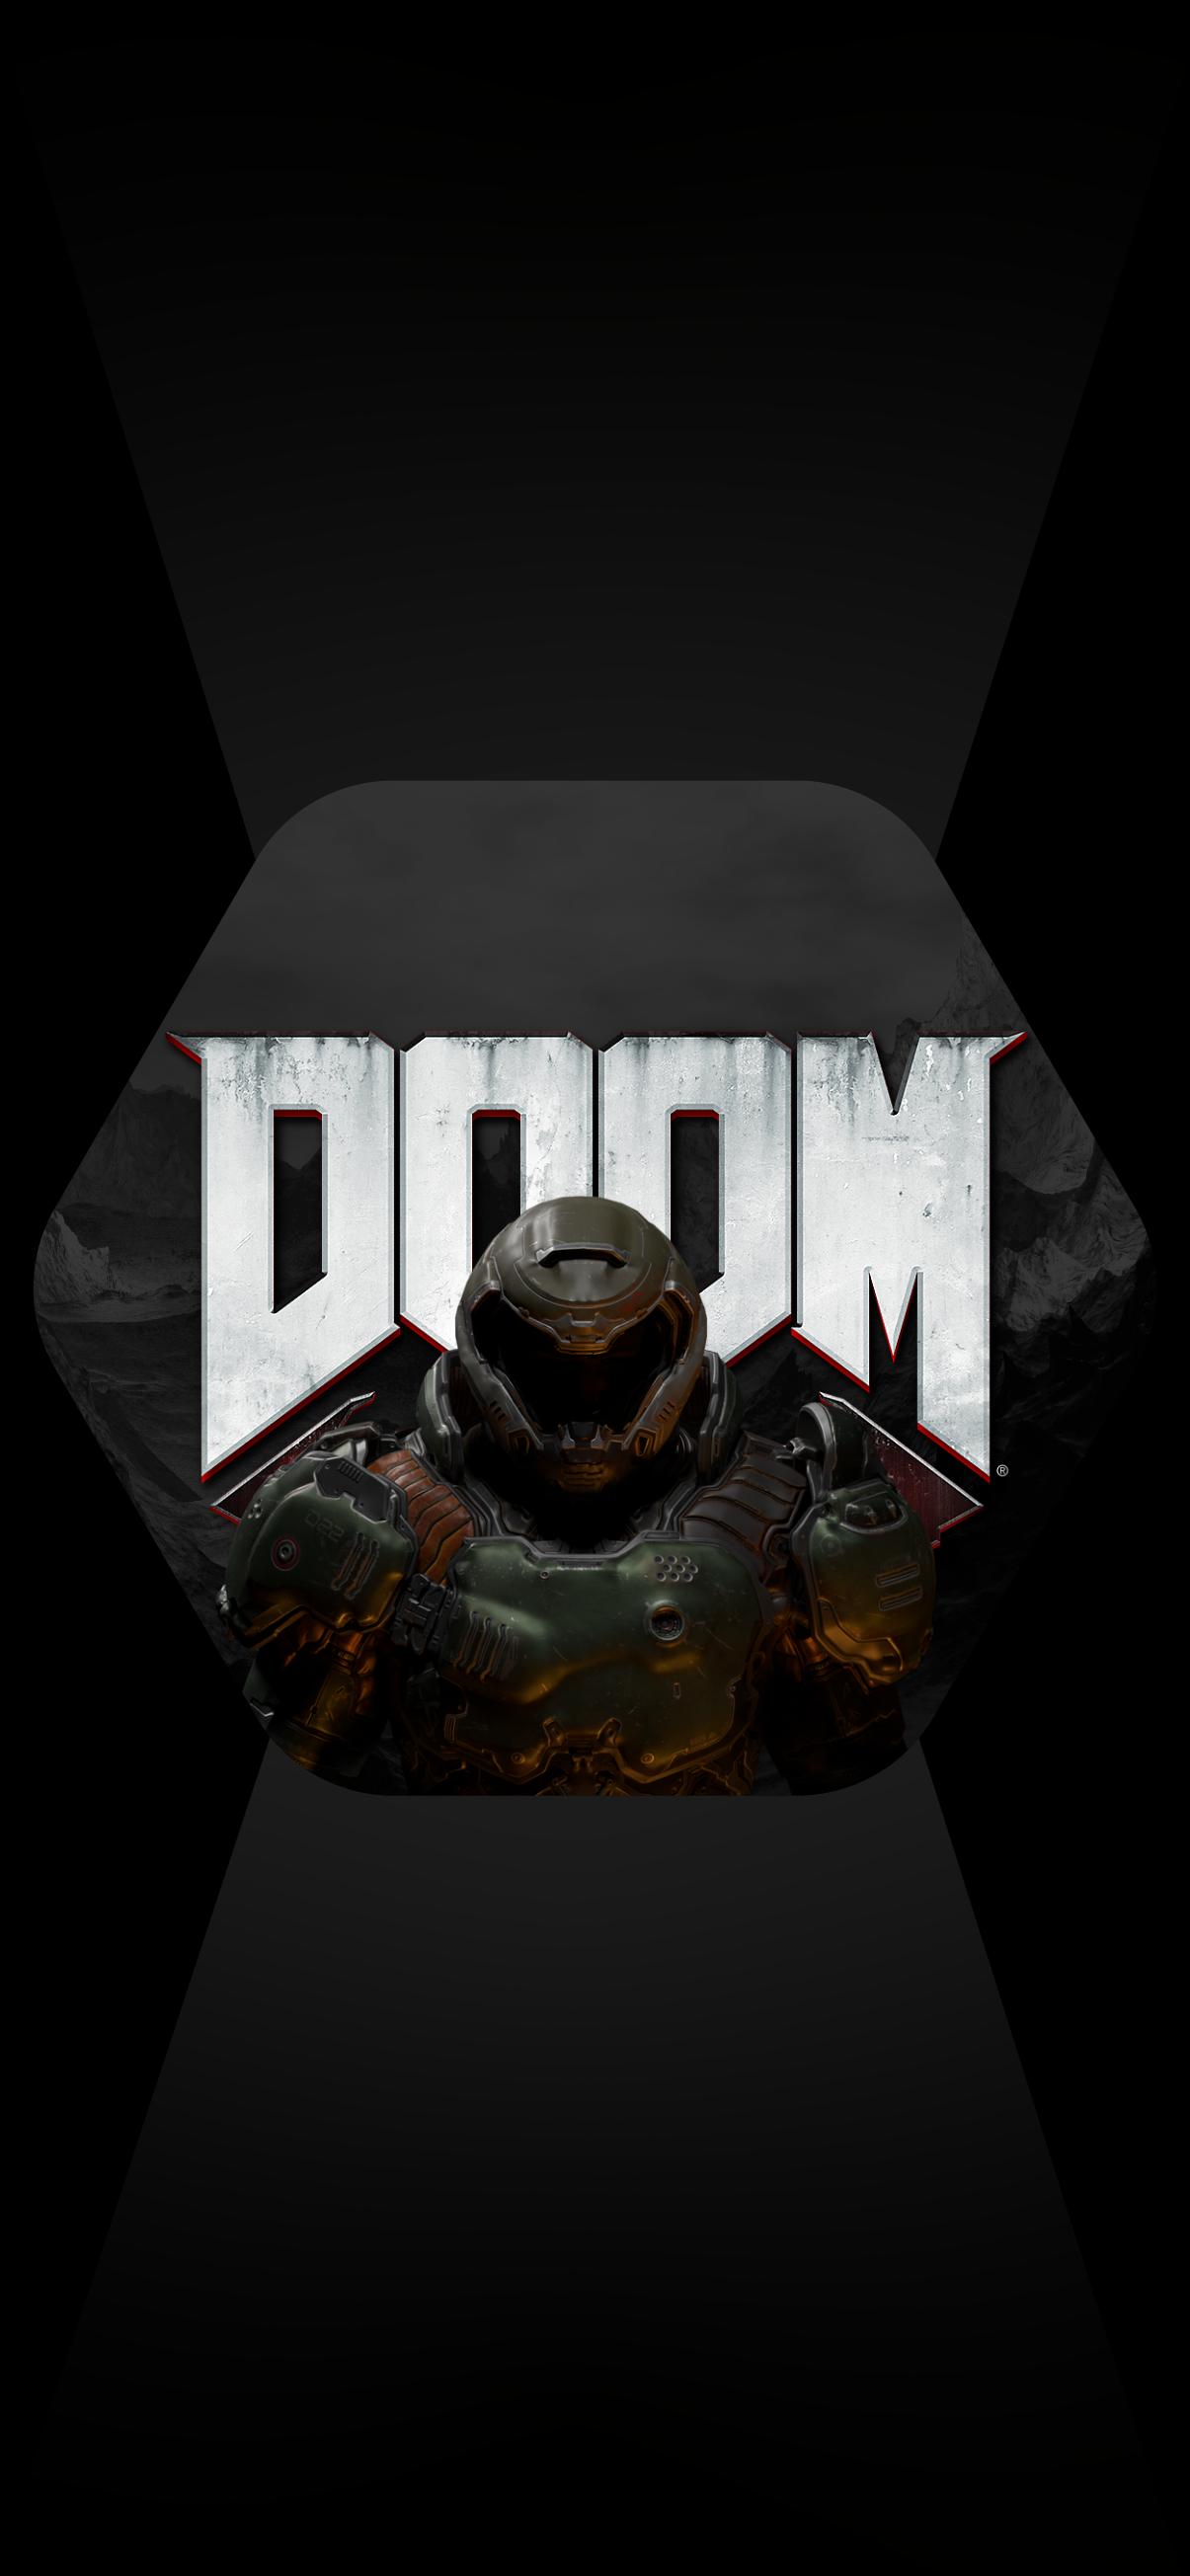 doom phone wallpaper dark hd